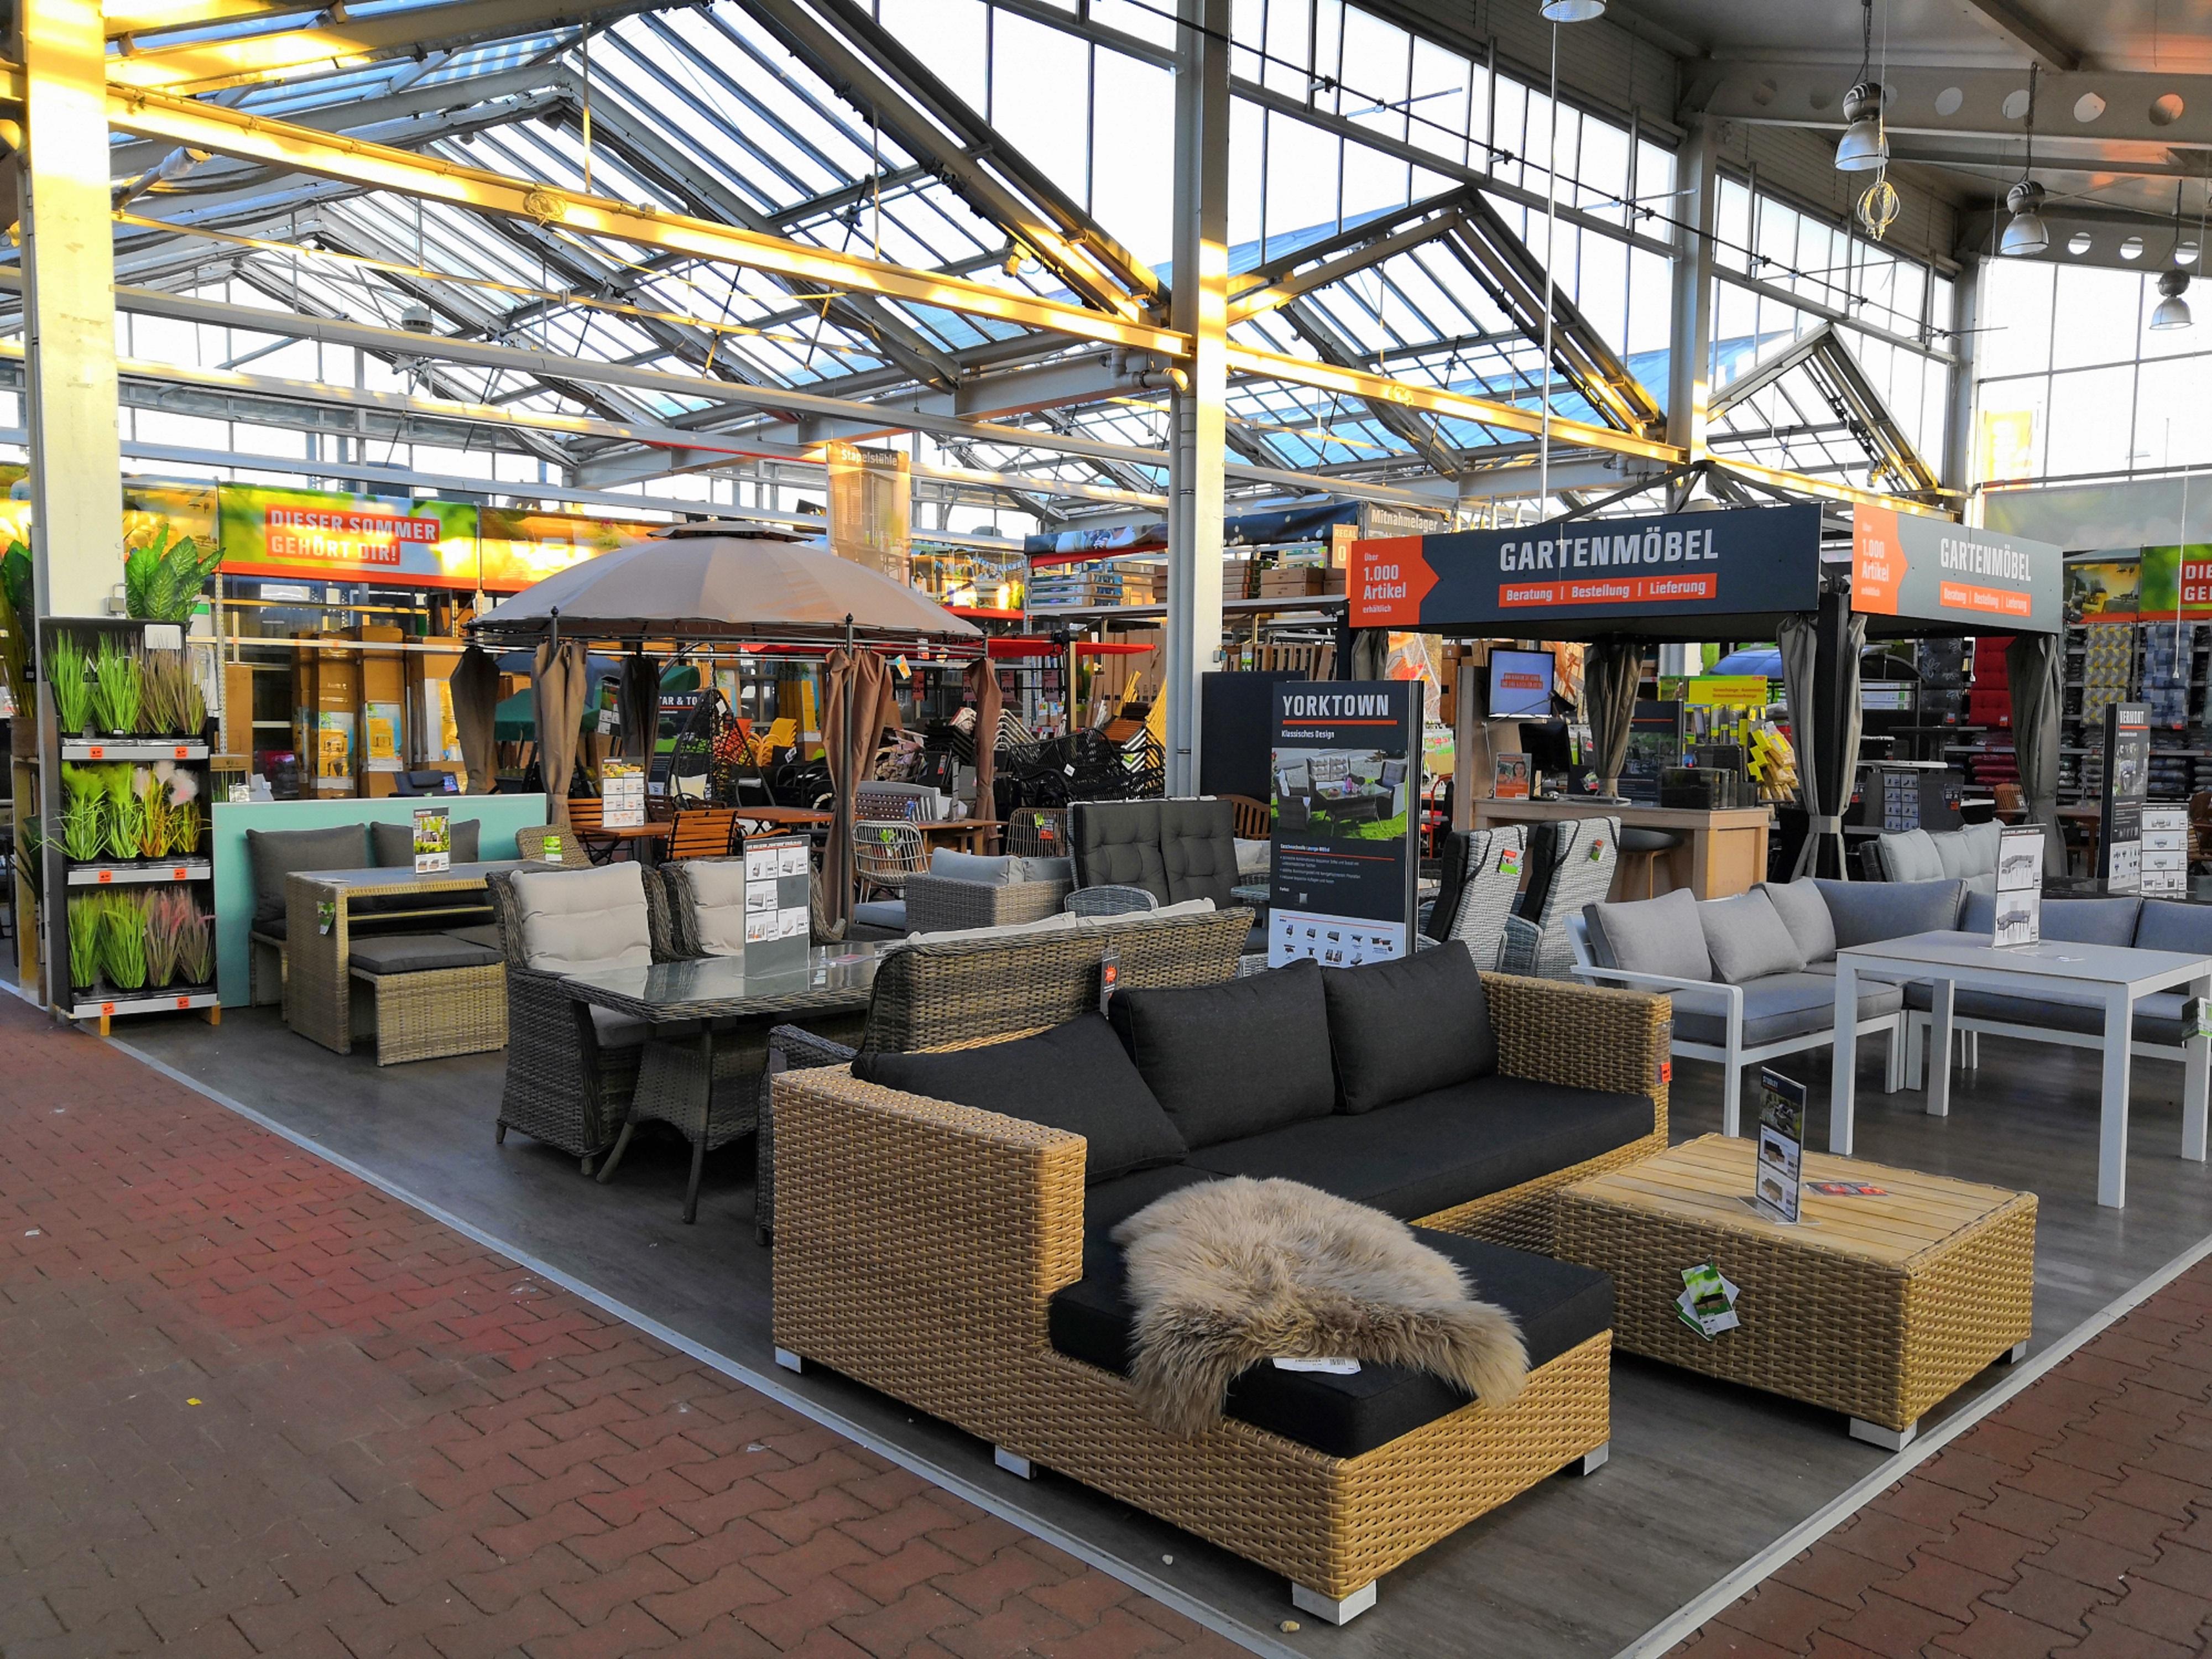 OBI Markt Wuppertal